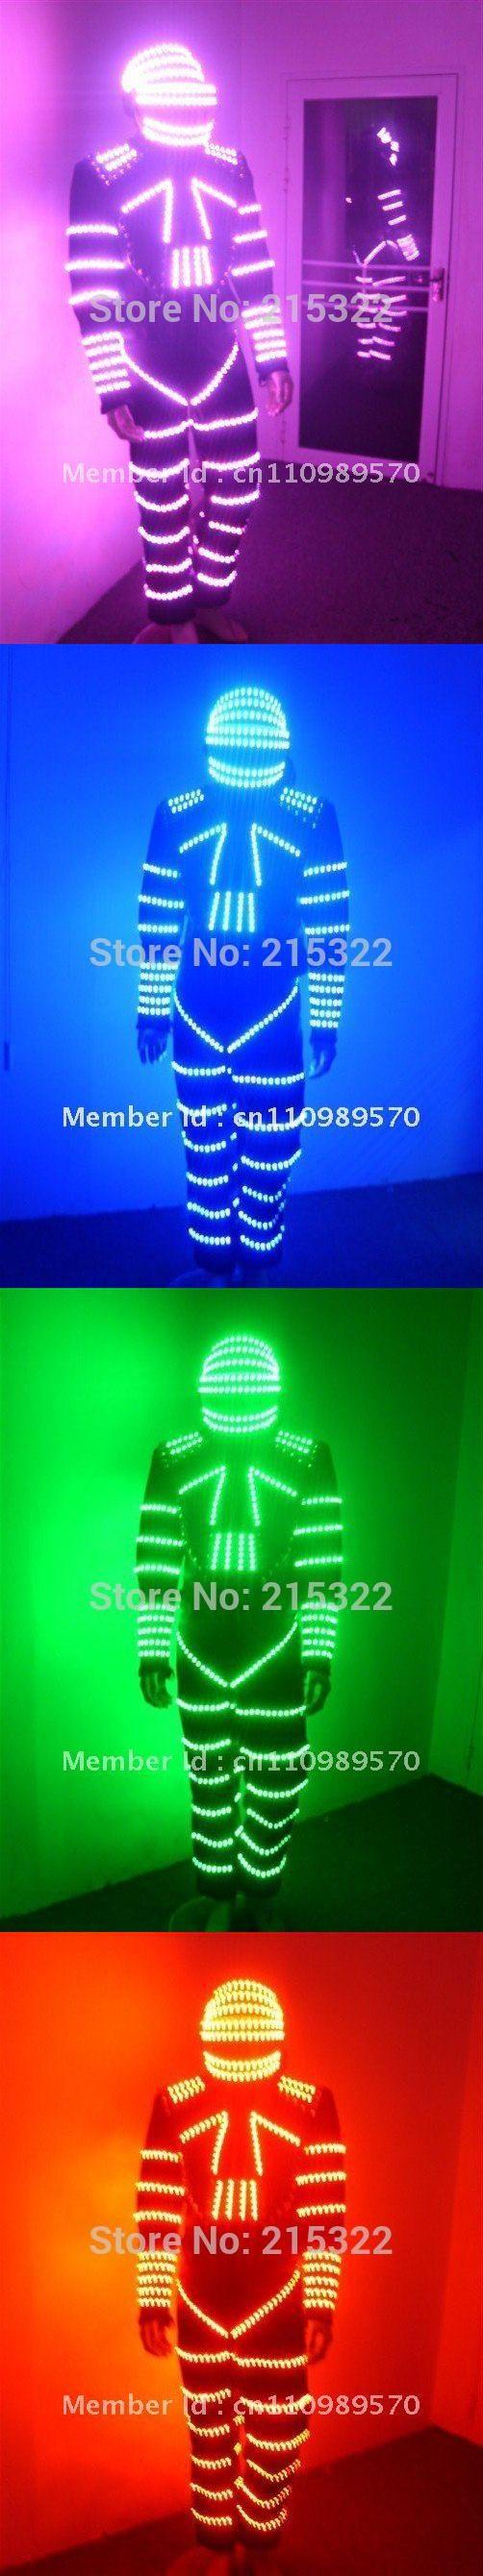 LED Costumes / LED robot suit / LED Dance costume / LED Light costume